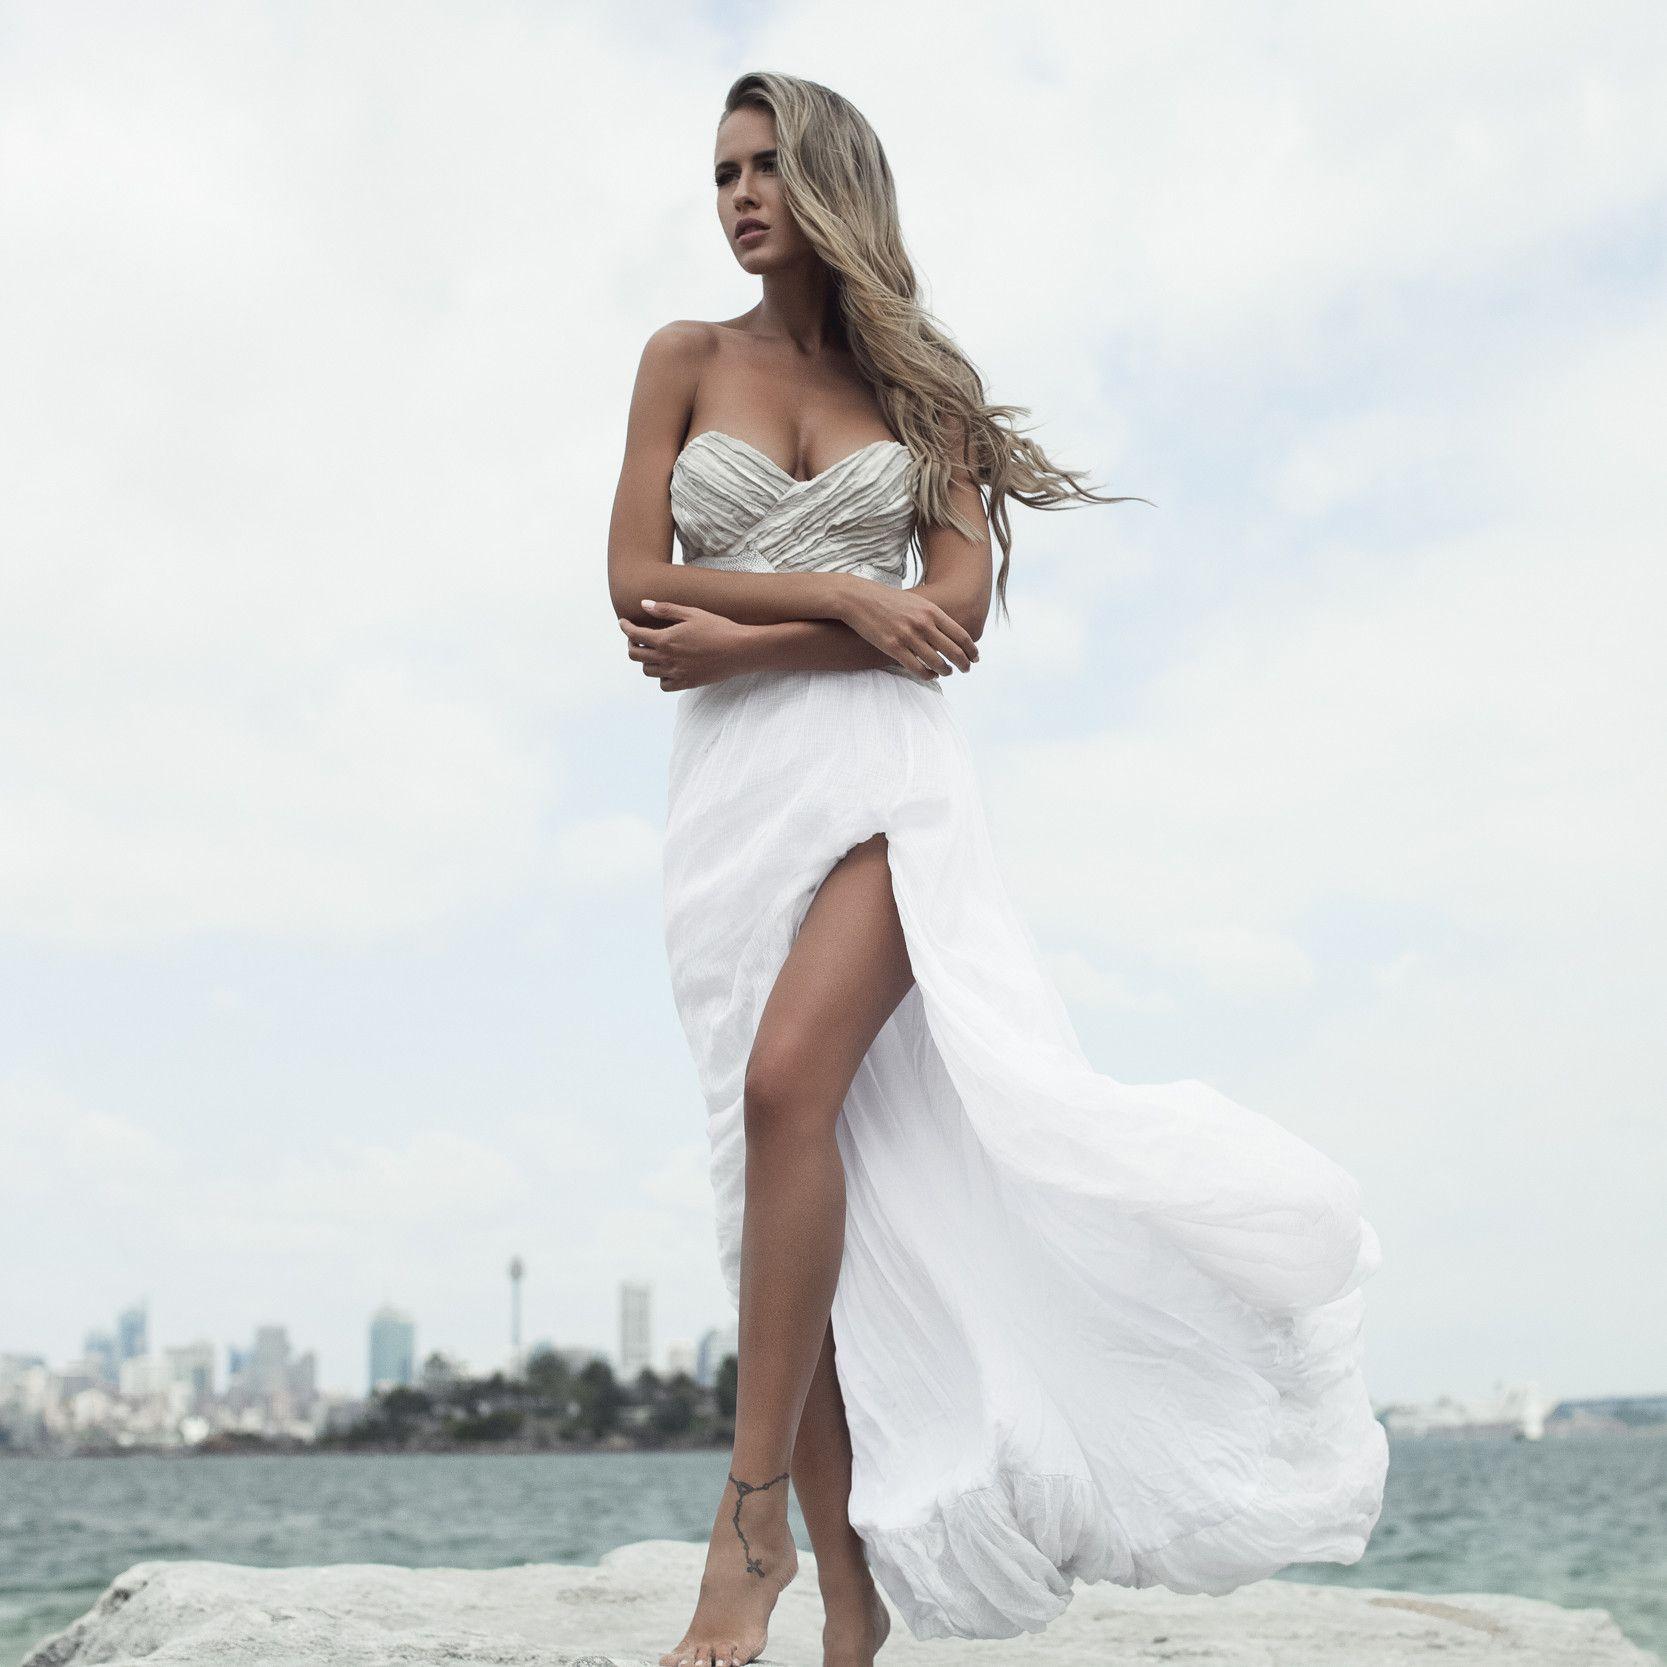 CLIP Sasha Pivovarova nudes (77 photos), Bikini Celebrites image